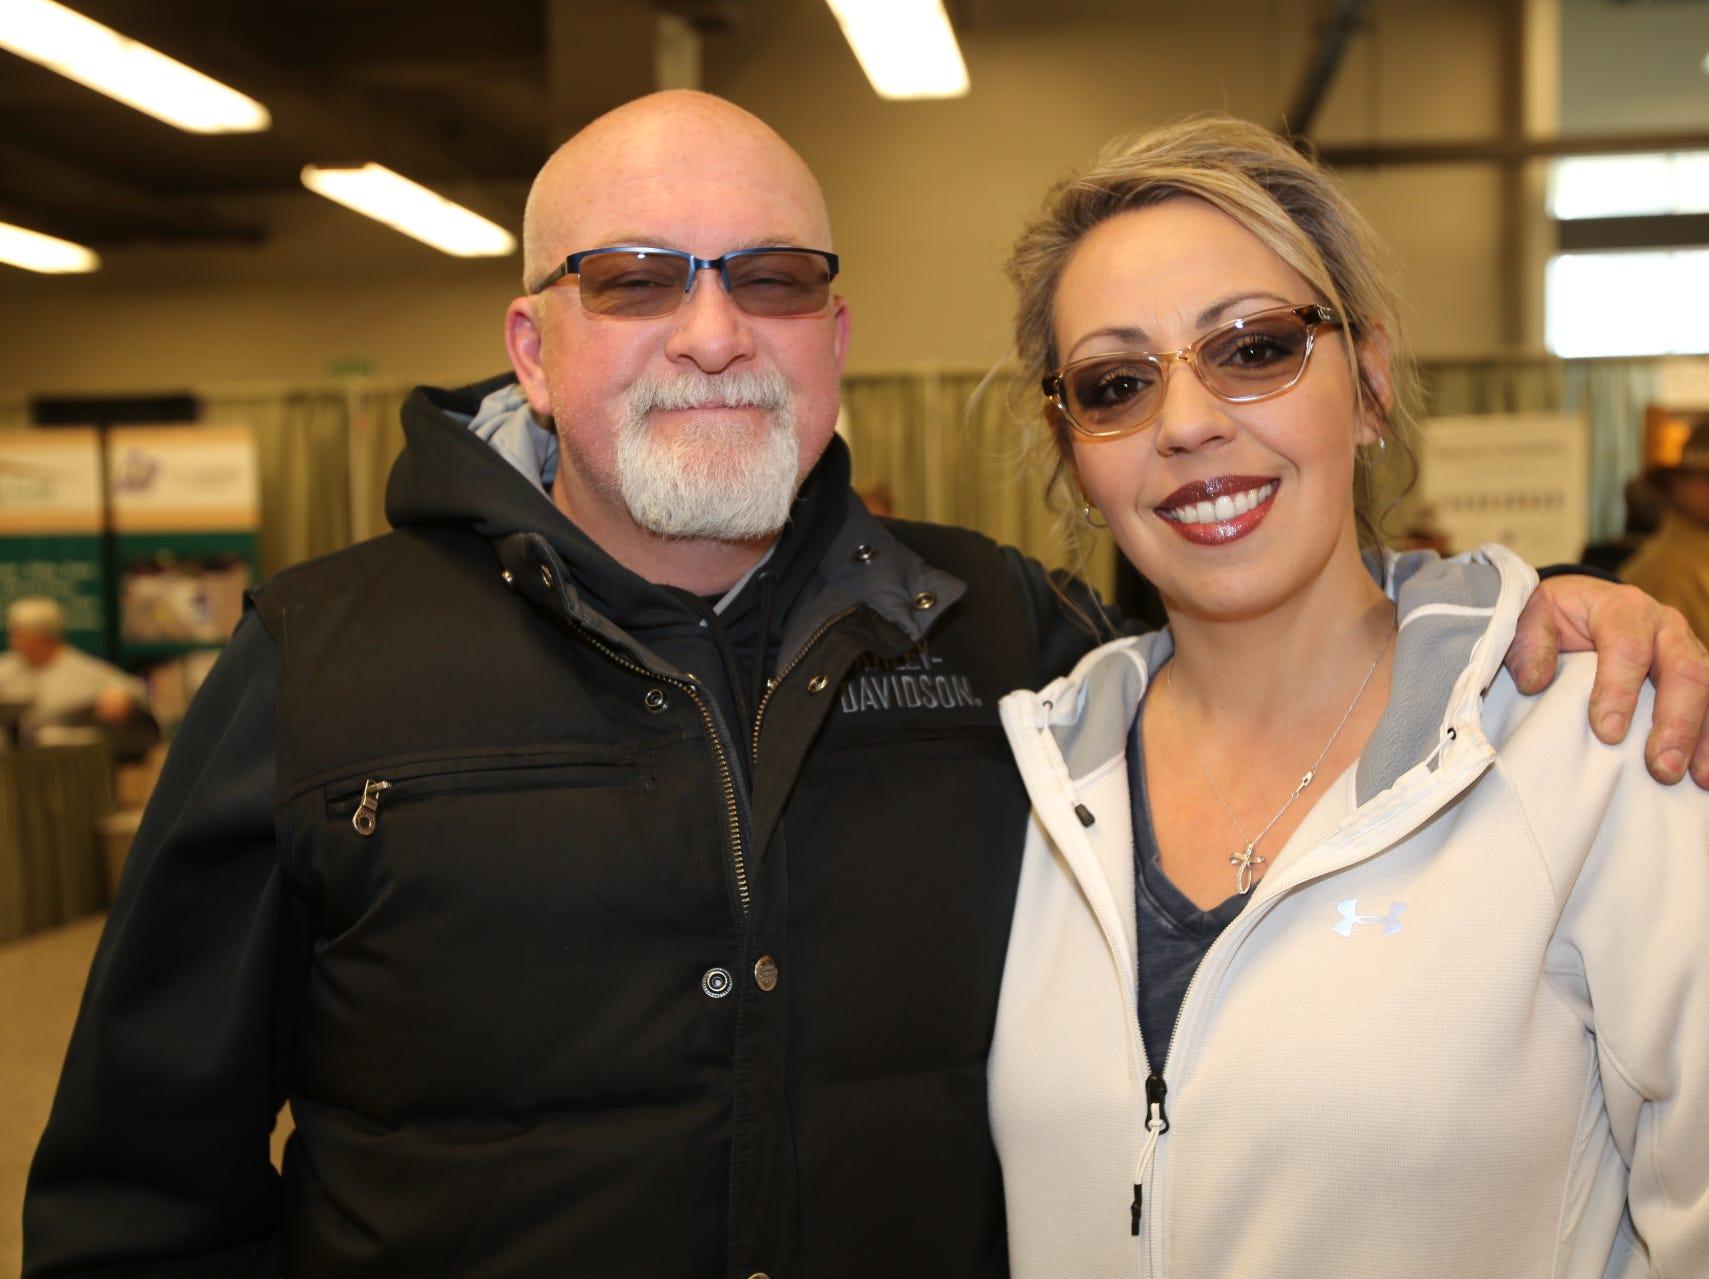 Danny and Cheryl Jennings